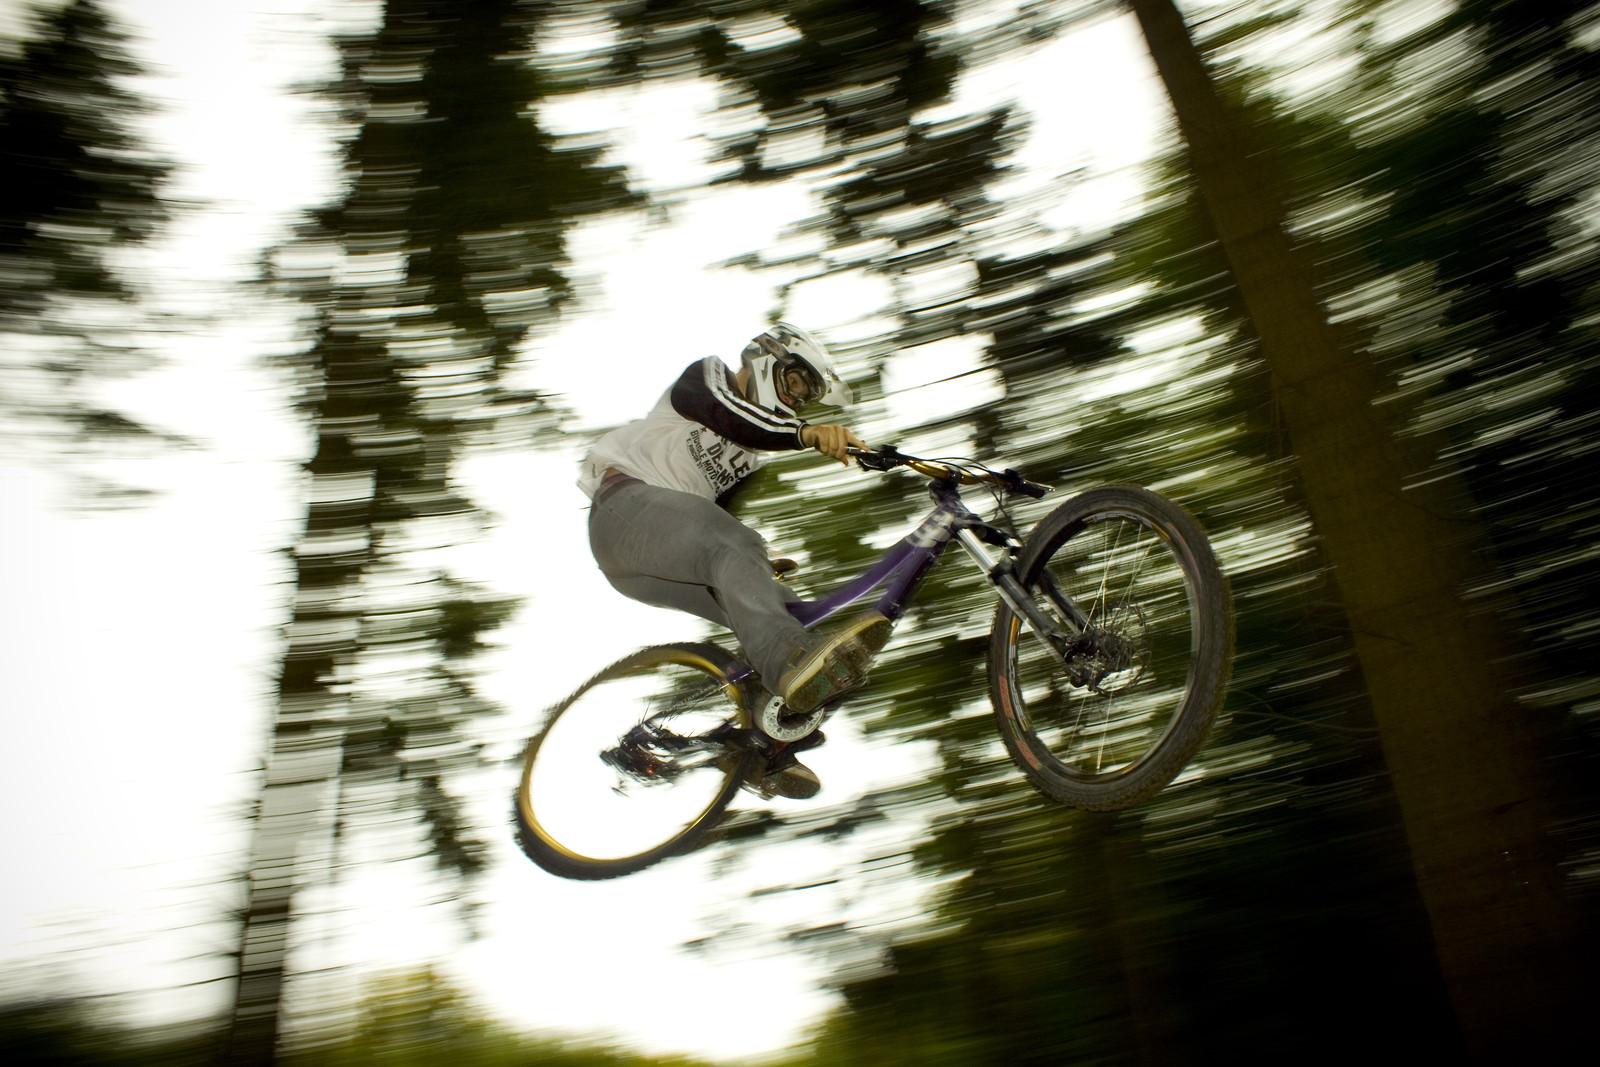 Rowan - bikematter - Mountain Biking Pictures - Vital MTB